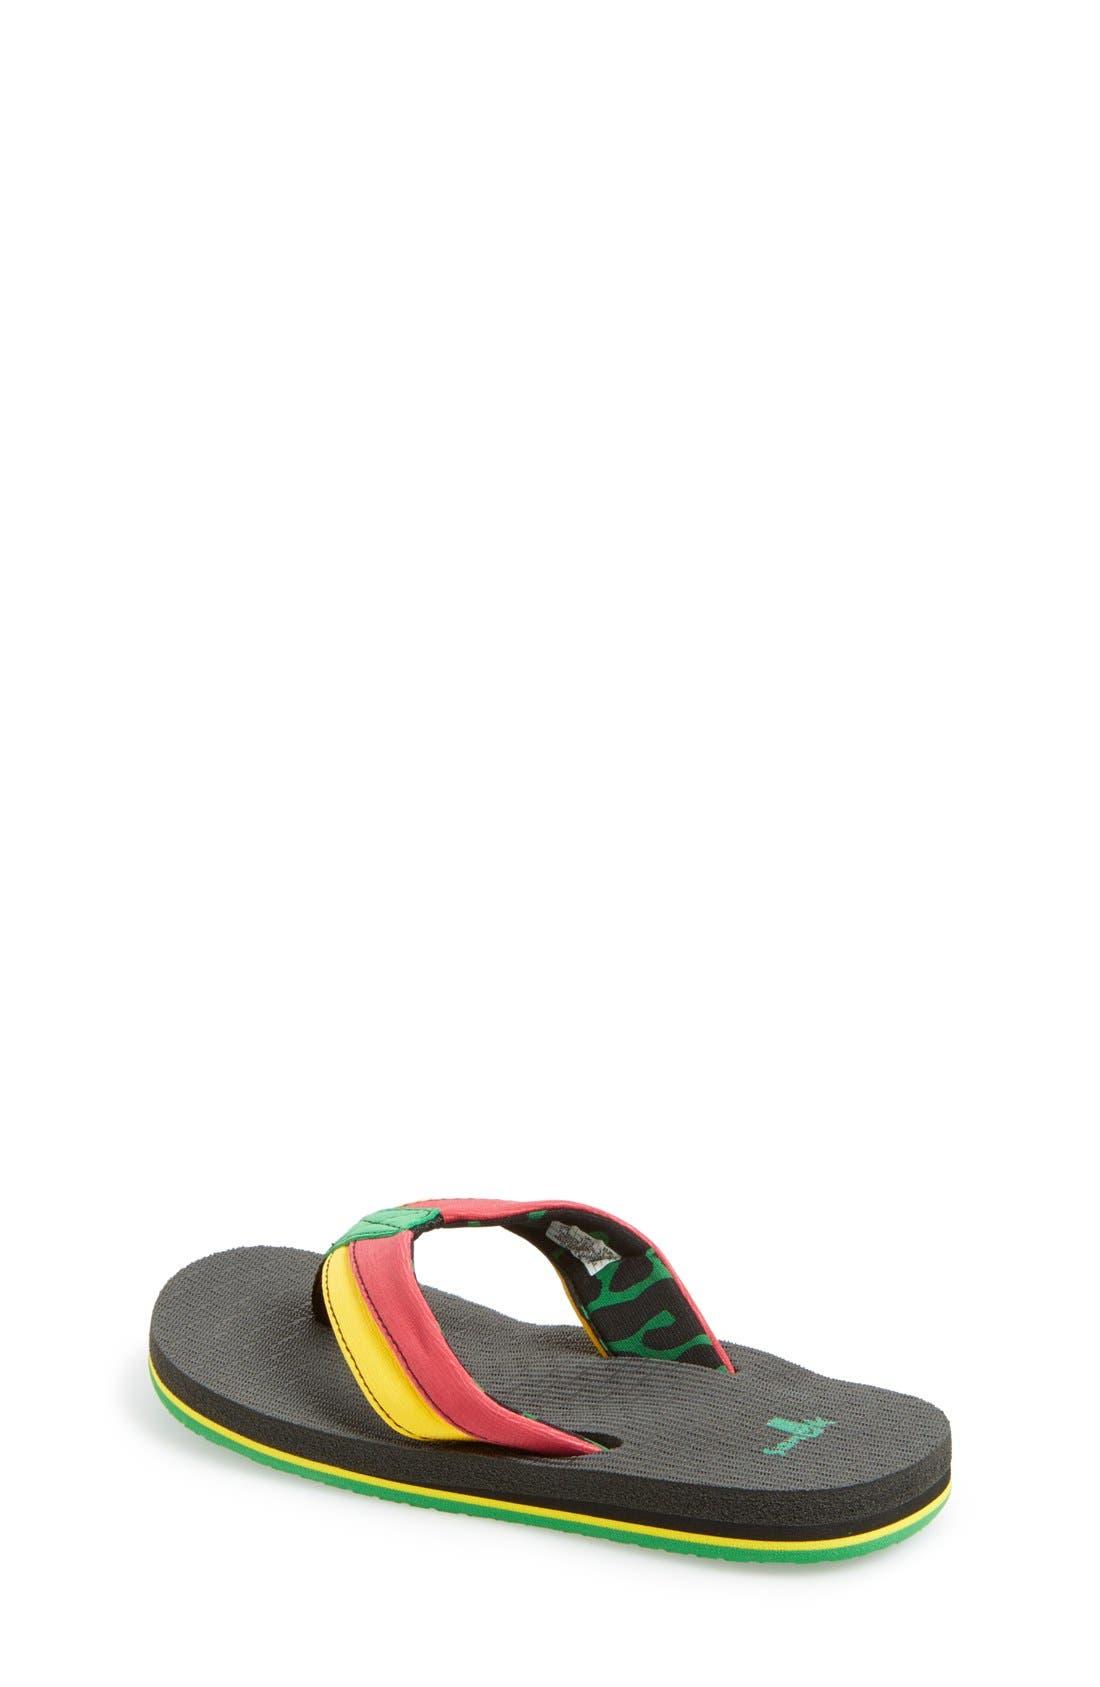 'Rootbeer Cozy' Lightweight Flip Flop Sandal,                             Alternate thumbnail 18, color,